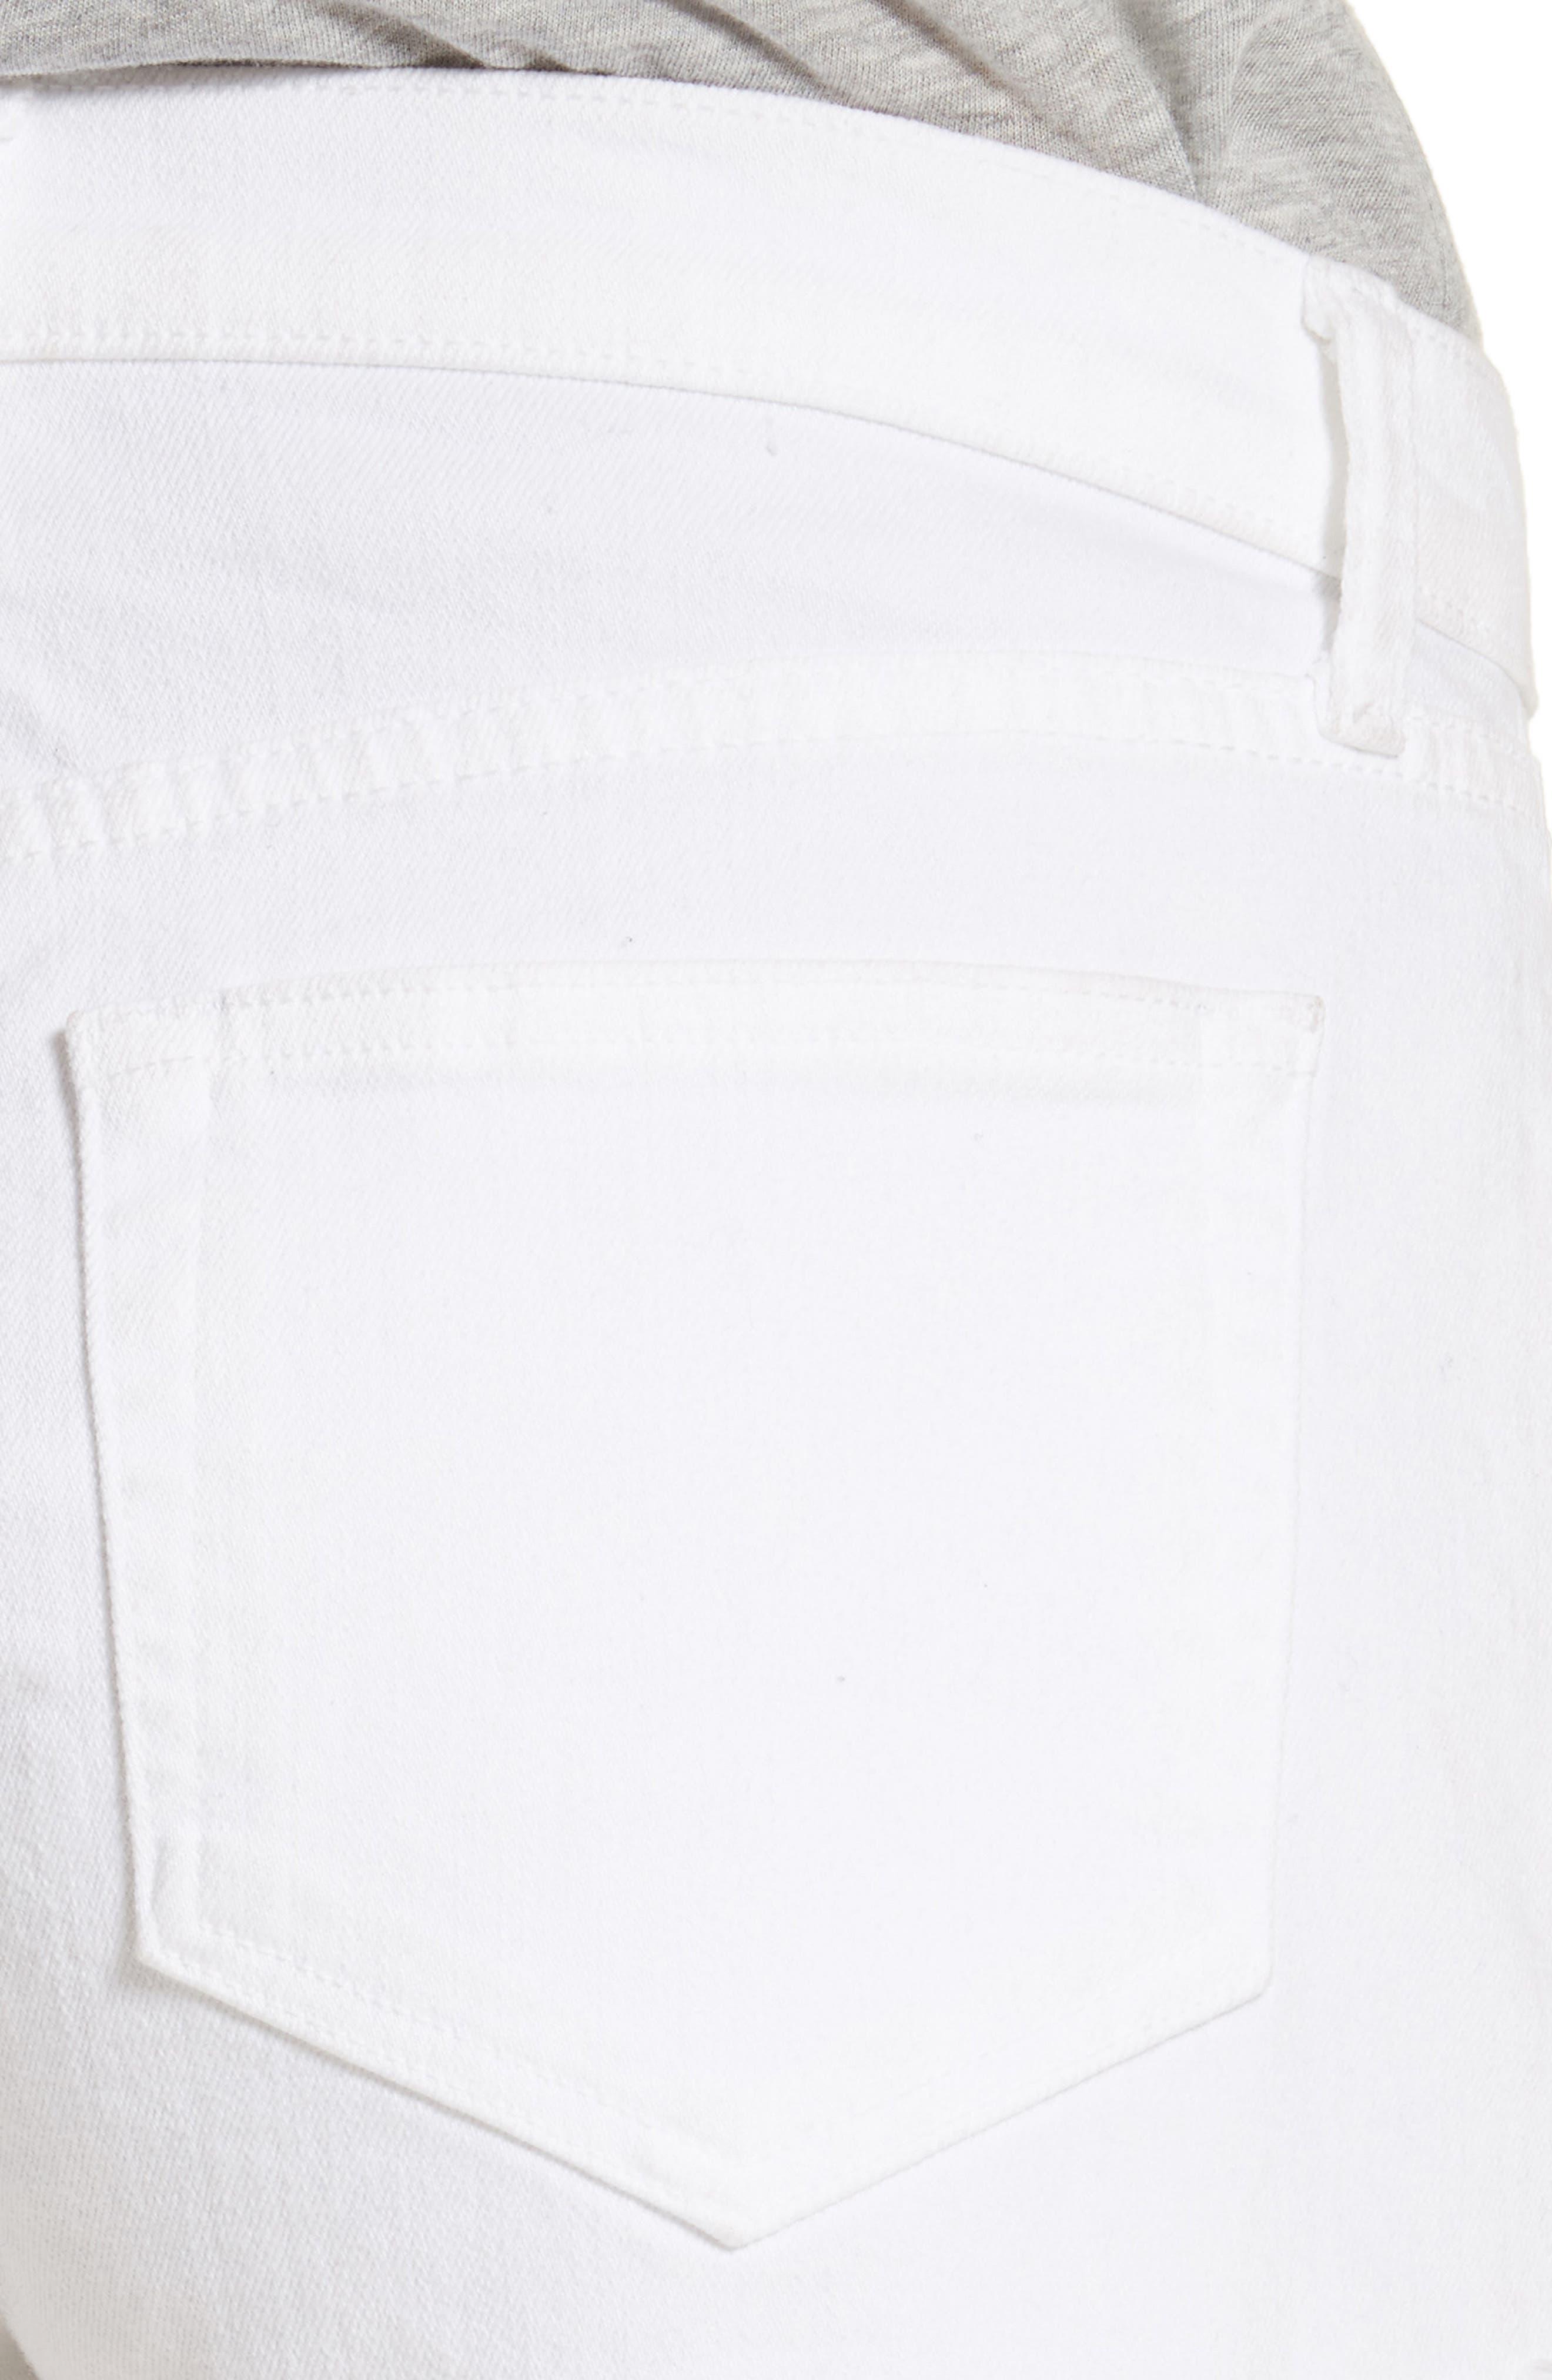 Zoe Cutoff Denim Shorts,                             Alternate thumbnail 4, color,                             100